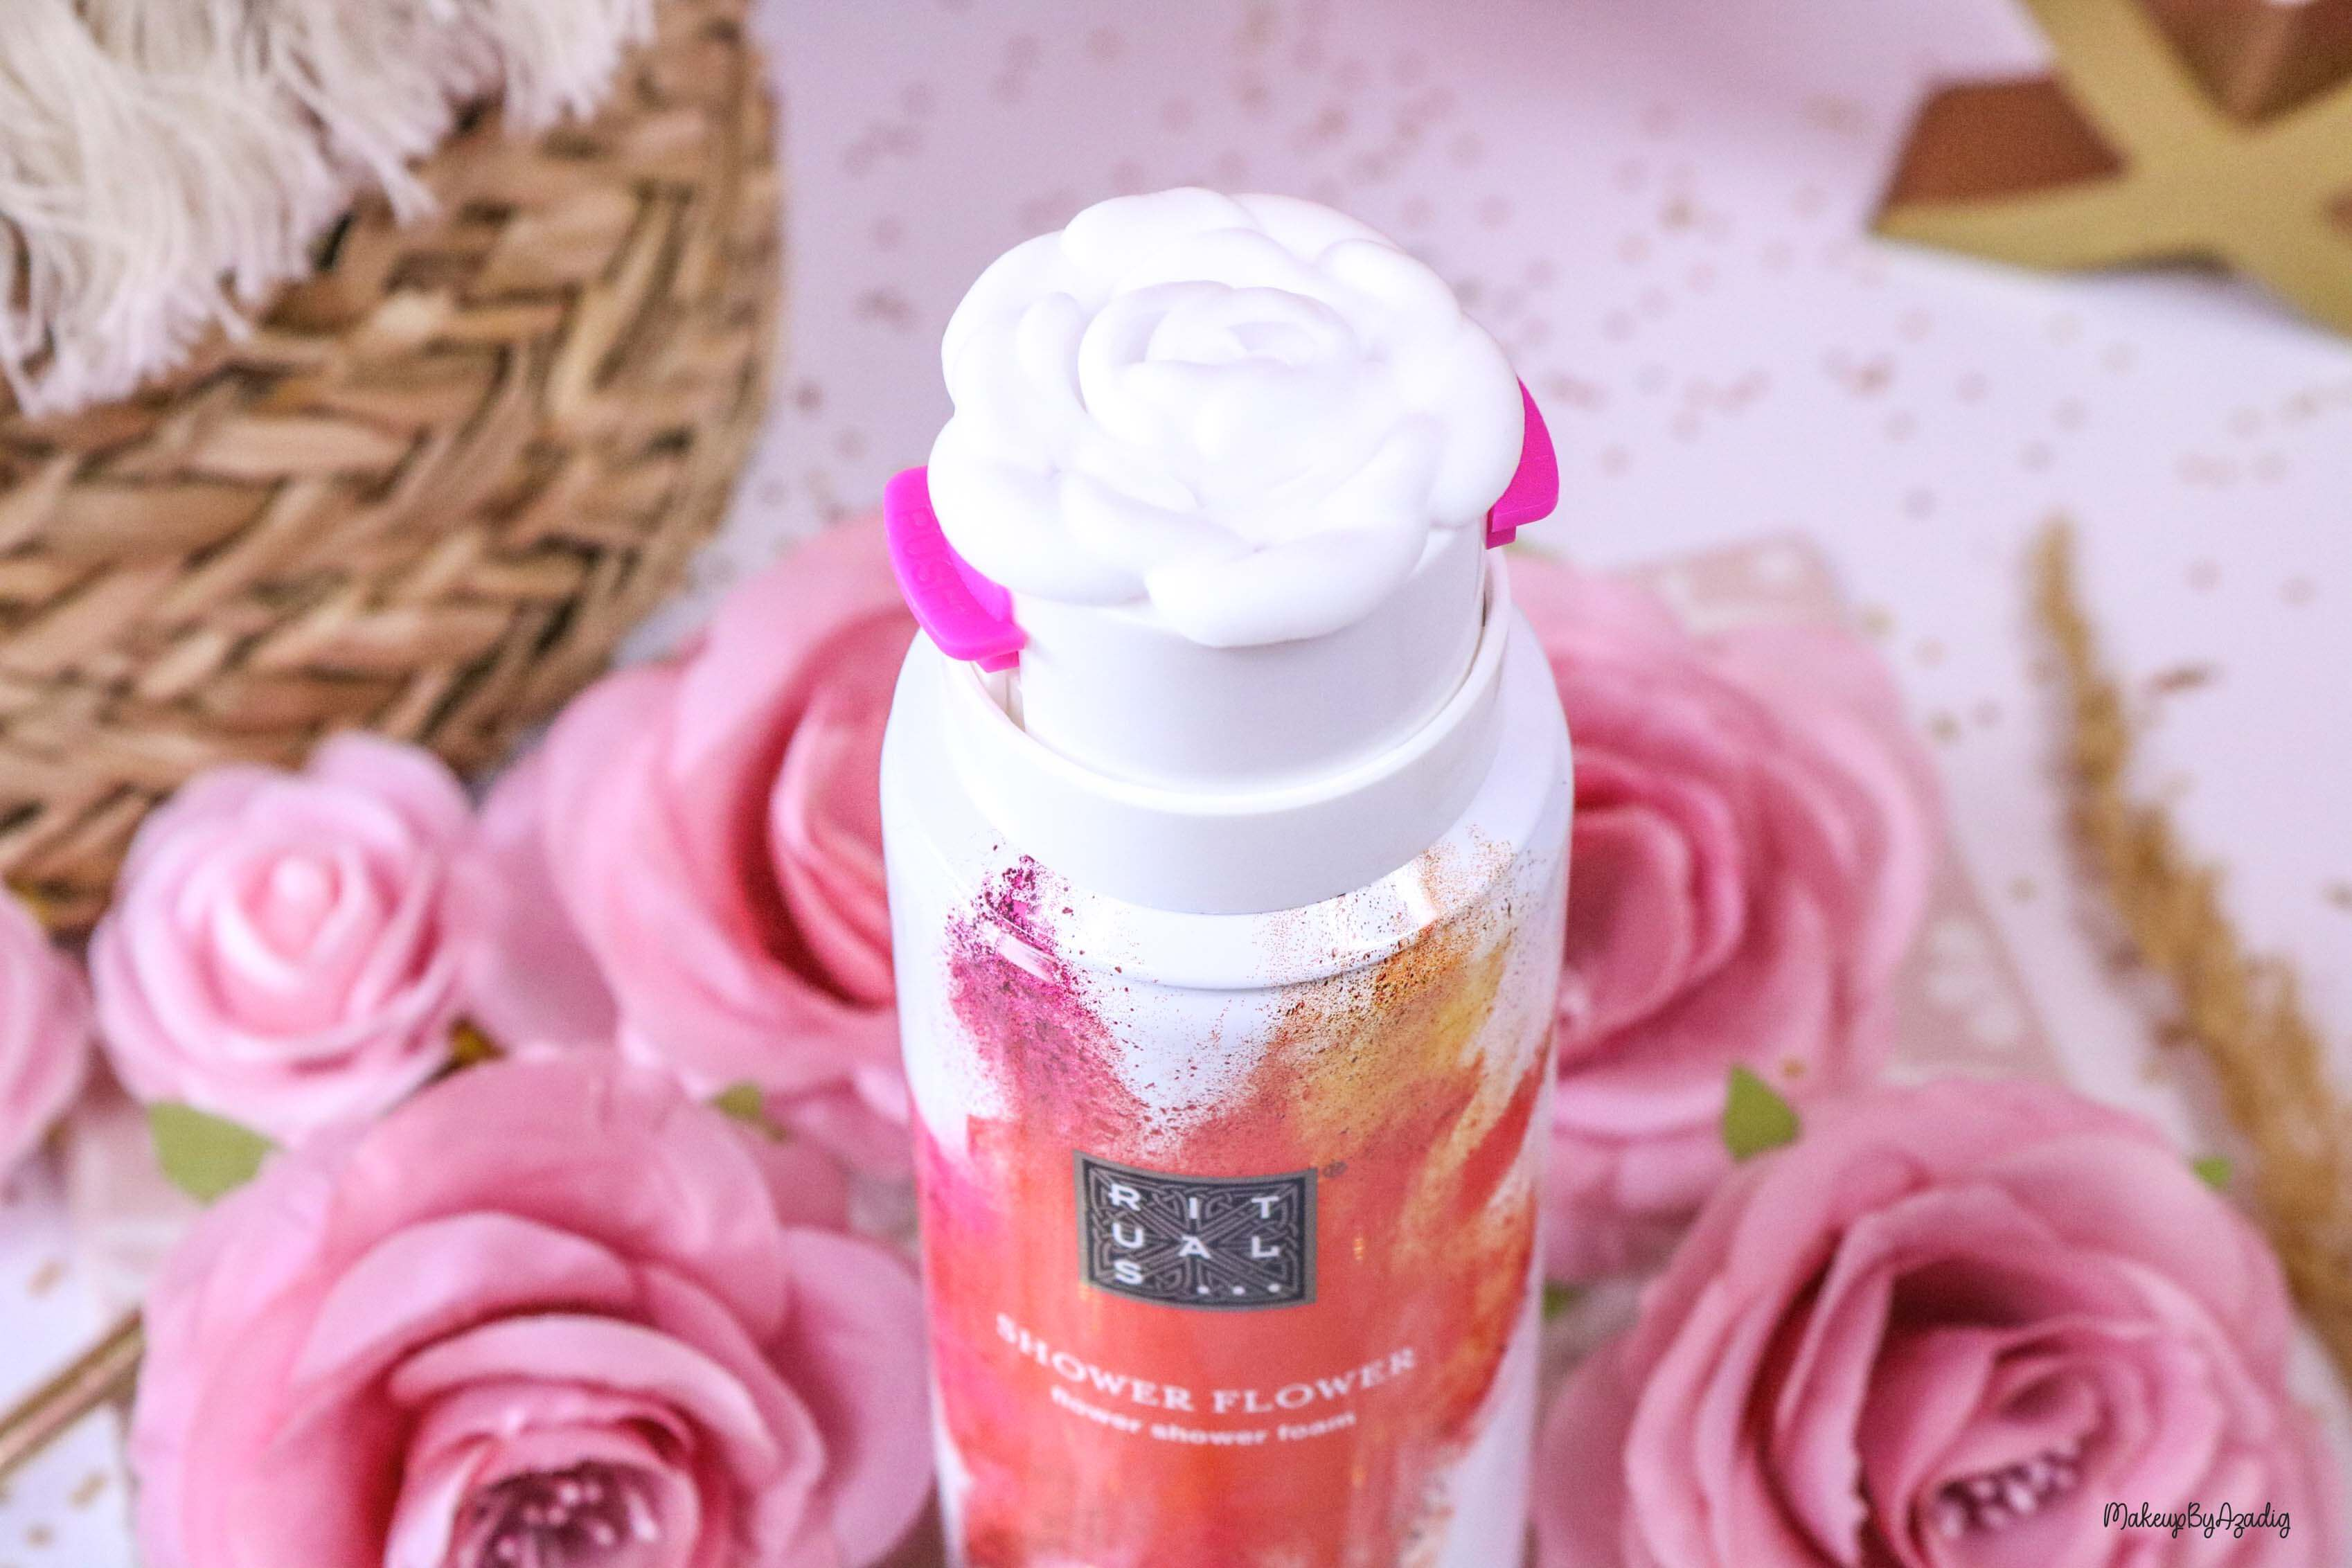 gel-douche-mousse-rituals-shower-flower-foam-ritual-hoi-makeupbyazadig-avis-prix-sephora-france-fleur